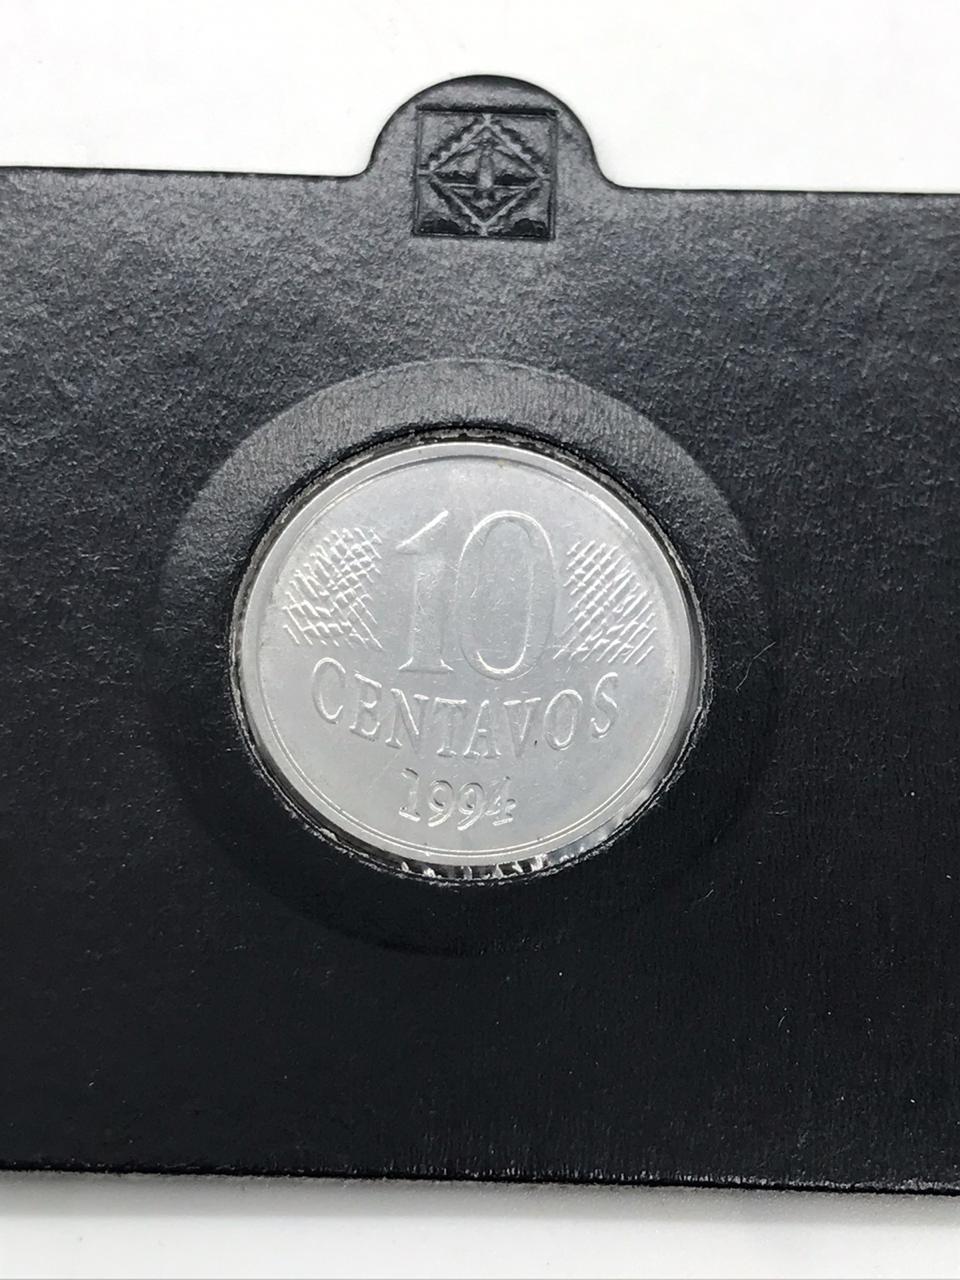 10 centavos 1994 reverso invertido